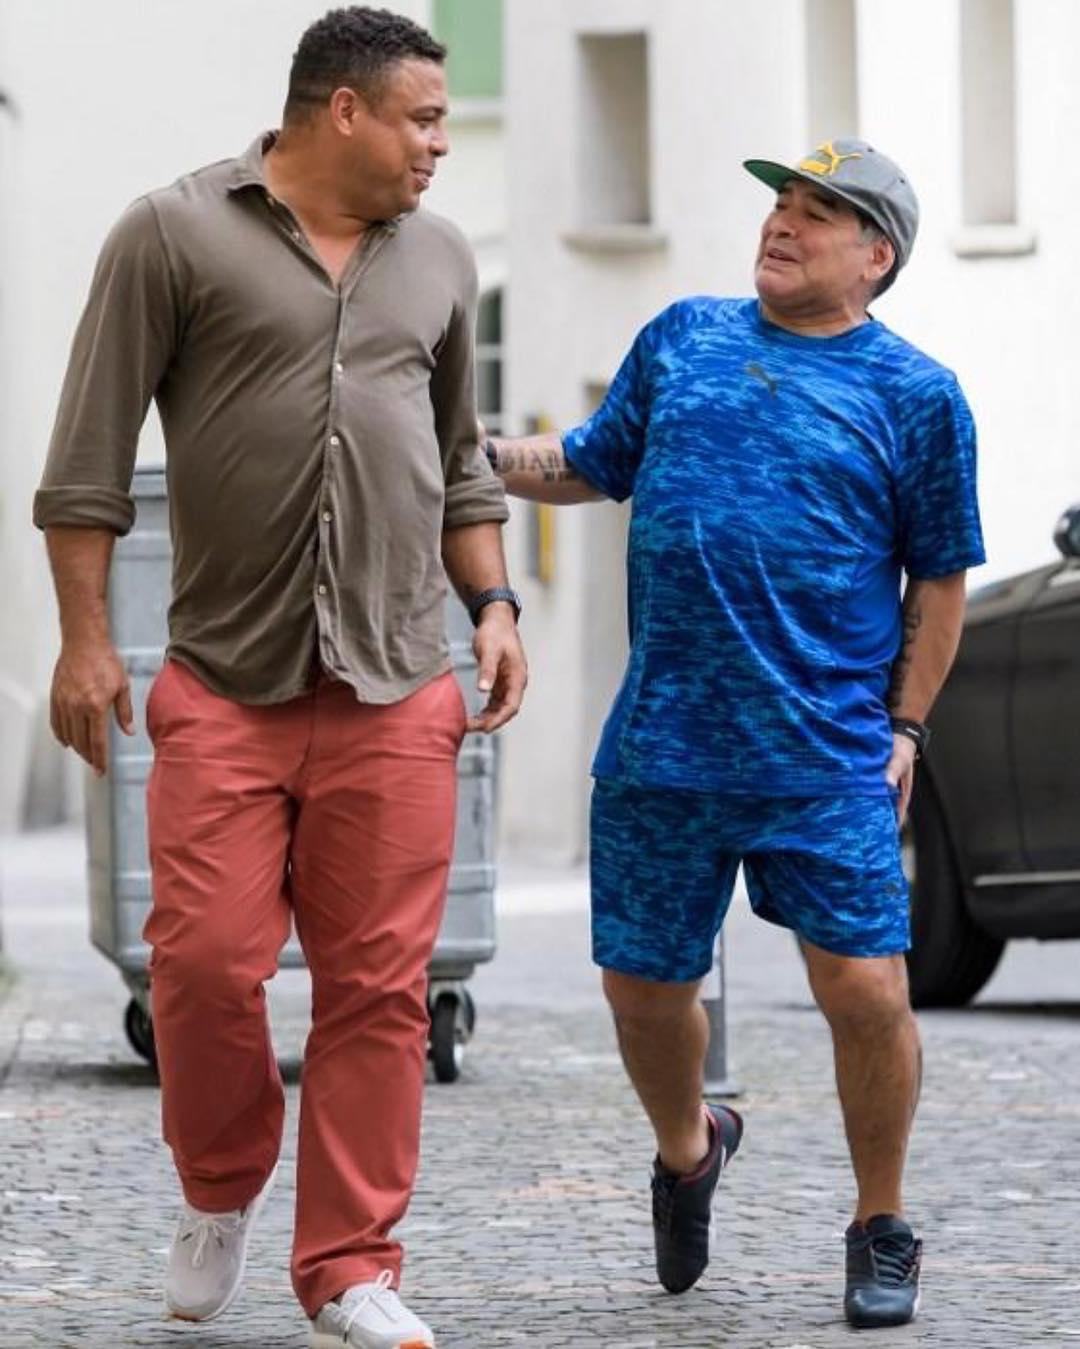 #Diego #Maradona #and #Ronaldo #pictured #together #in #Switzerland https://t.co/KncrNrdgCE  #shitgotdeep,#soccer https://t.co/YKp4lpIJtV